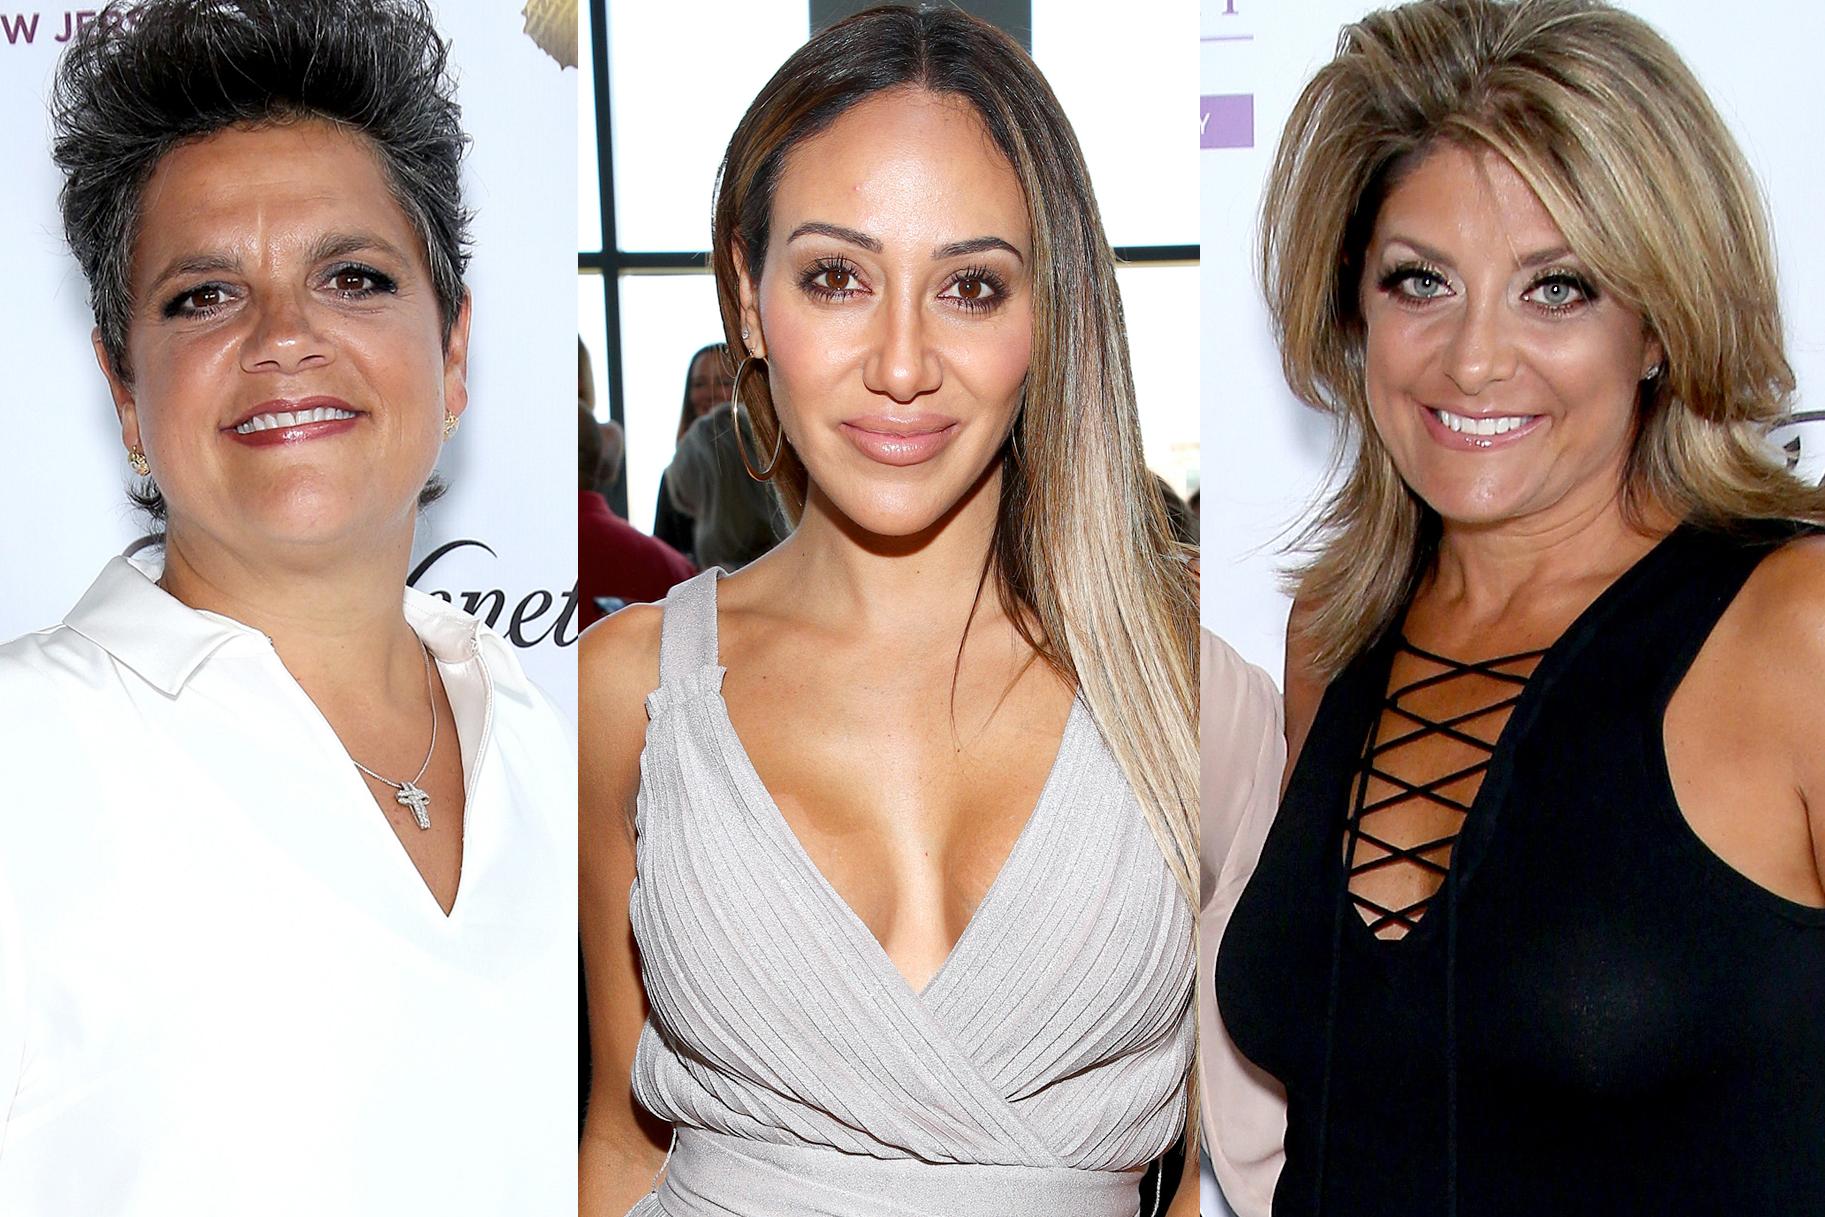 Melissa Gorga Doesn't Seem to Mind If Kathy Wakile & Rosie Pierri Return to RHONJ